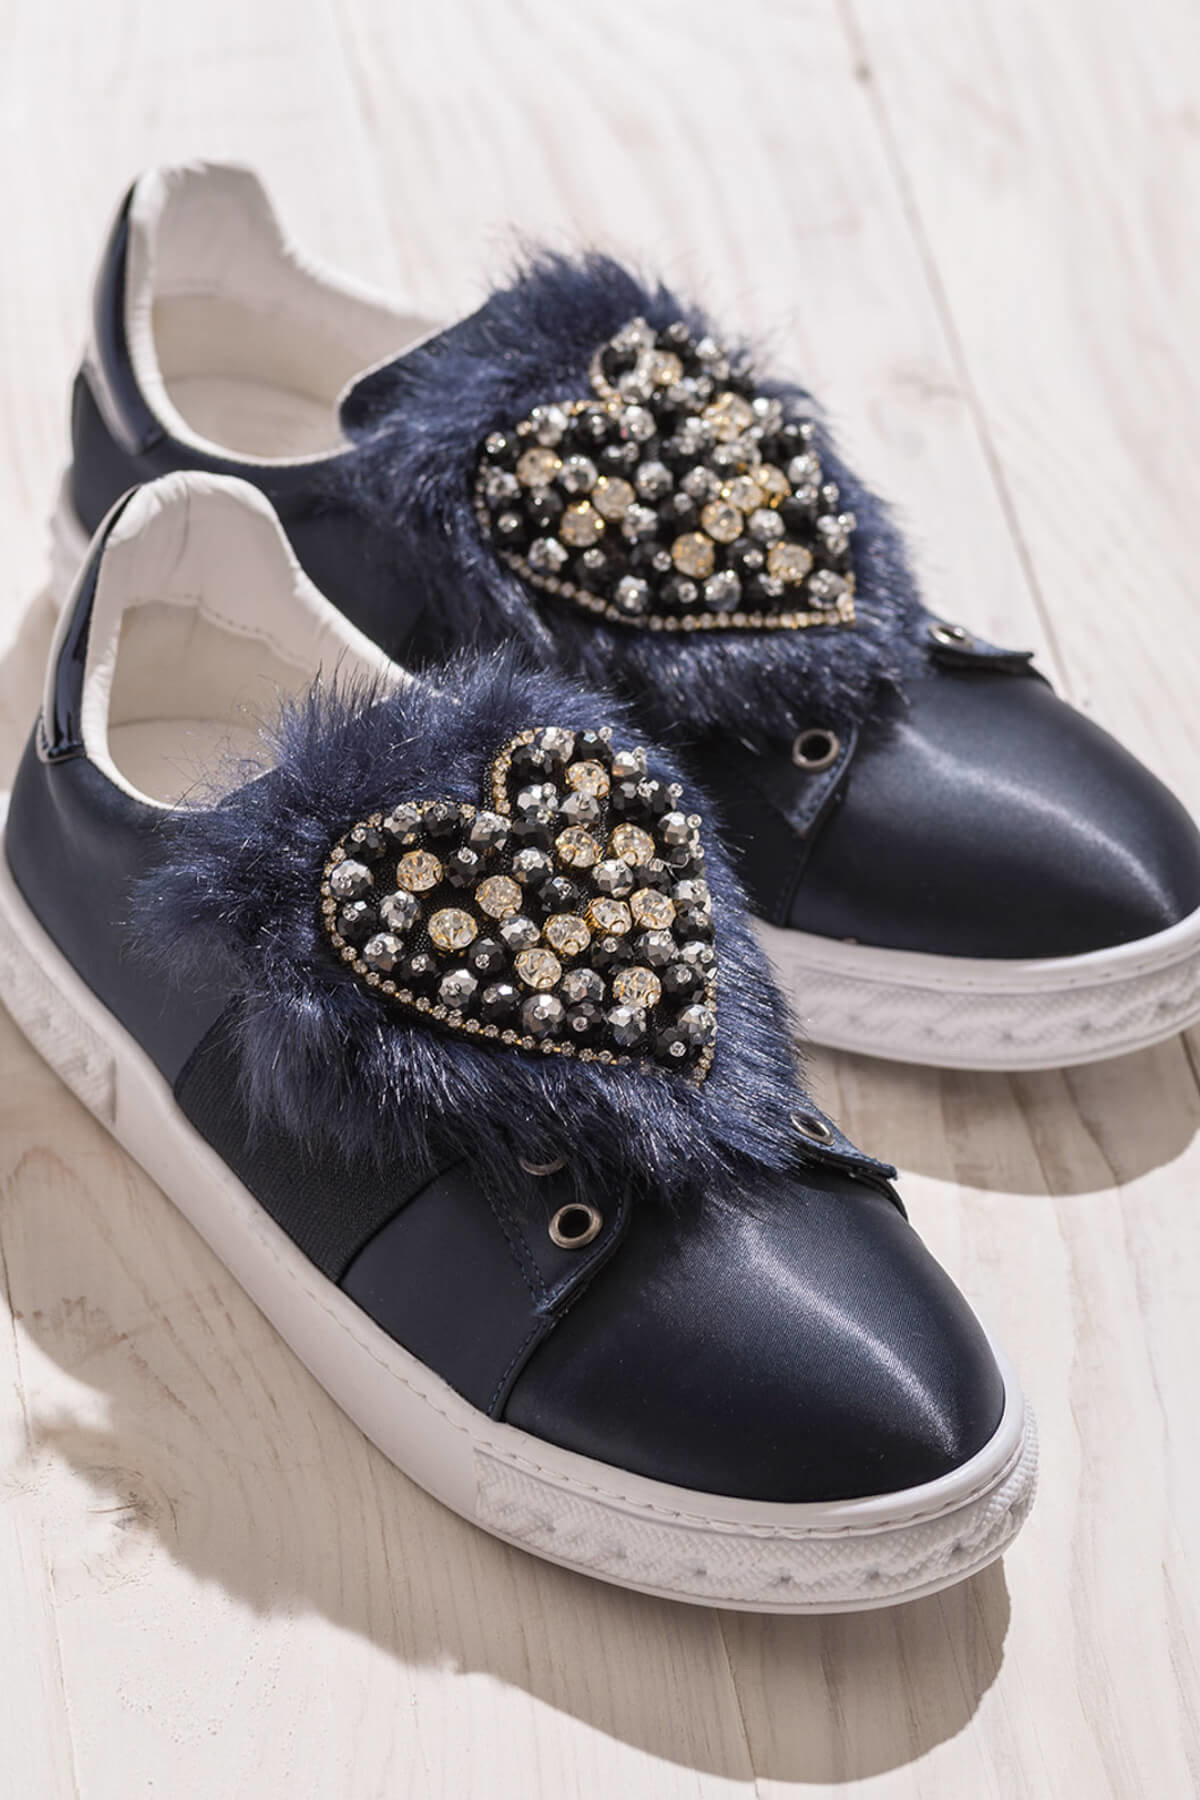 حذاء بناتي ونسائي ماركة ايلي اسود